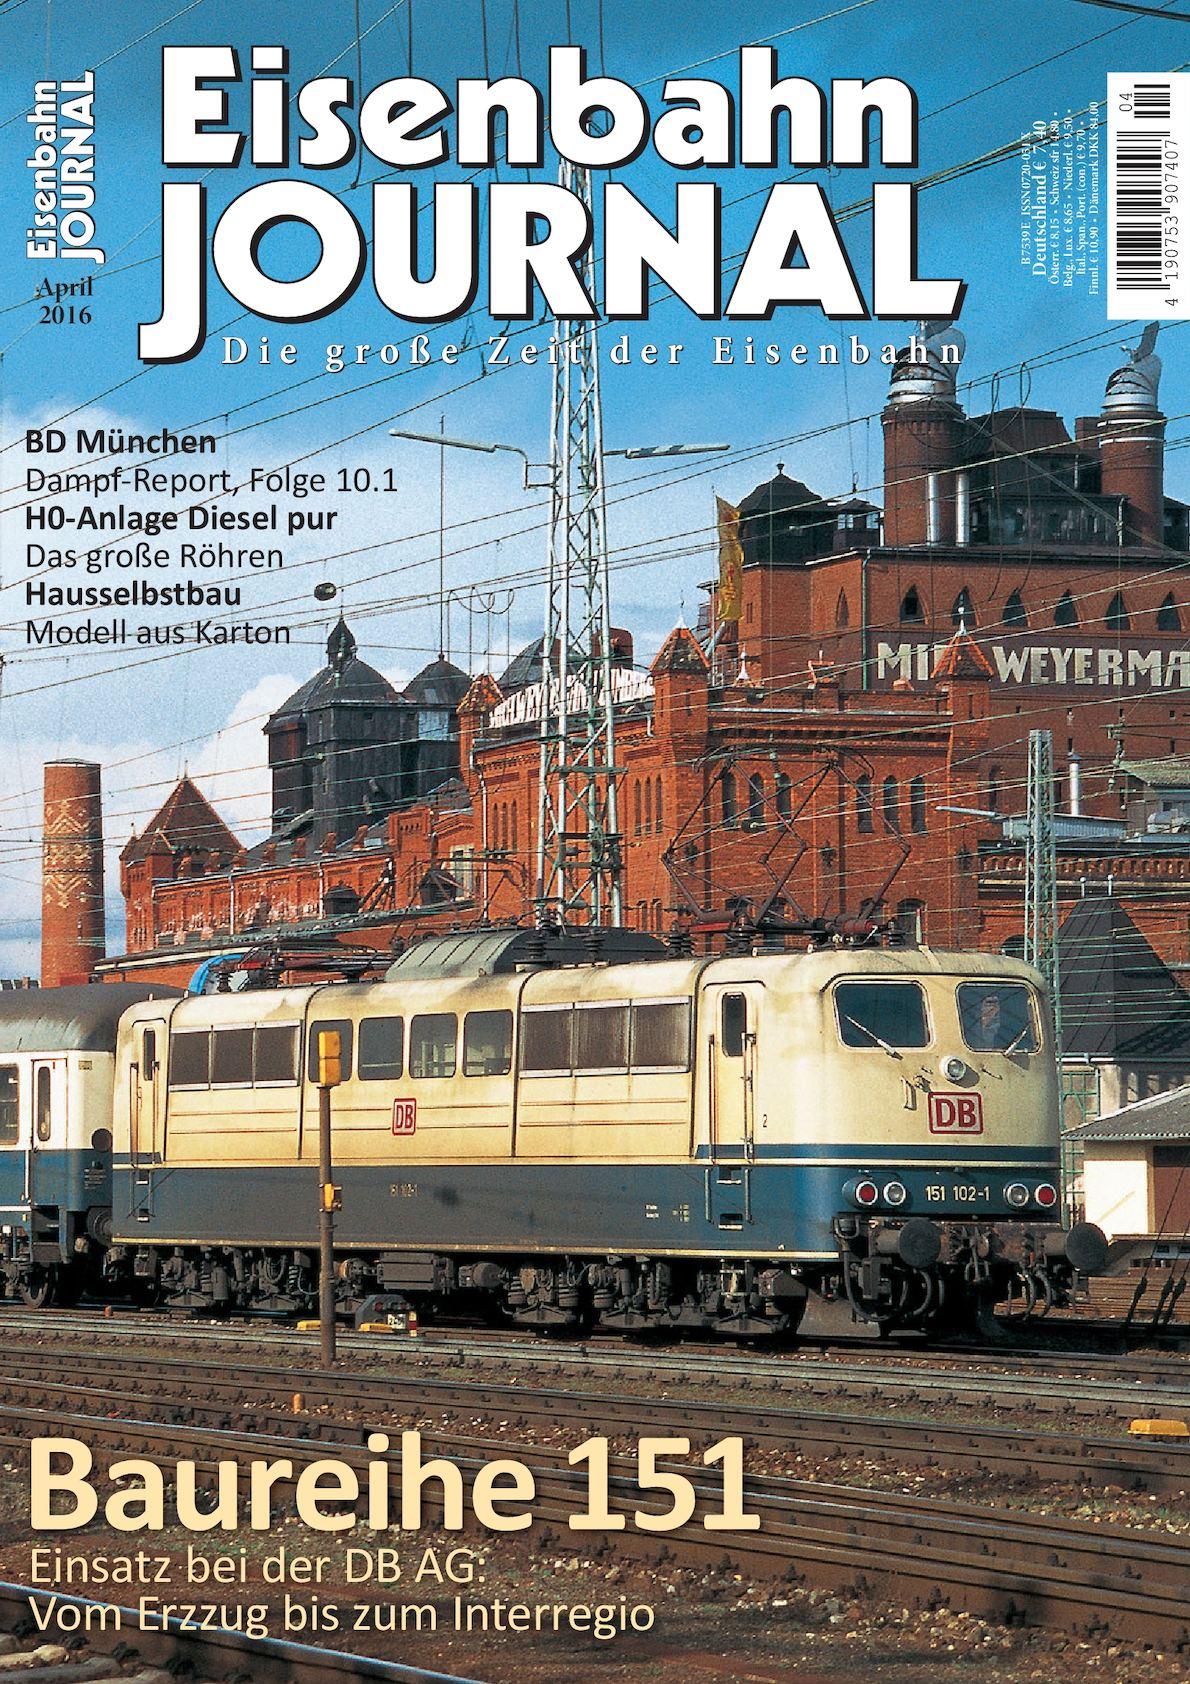 Calaméo - Eisenbahn Journal 04 2016